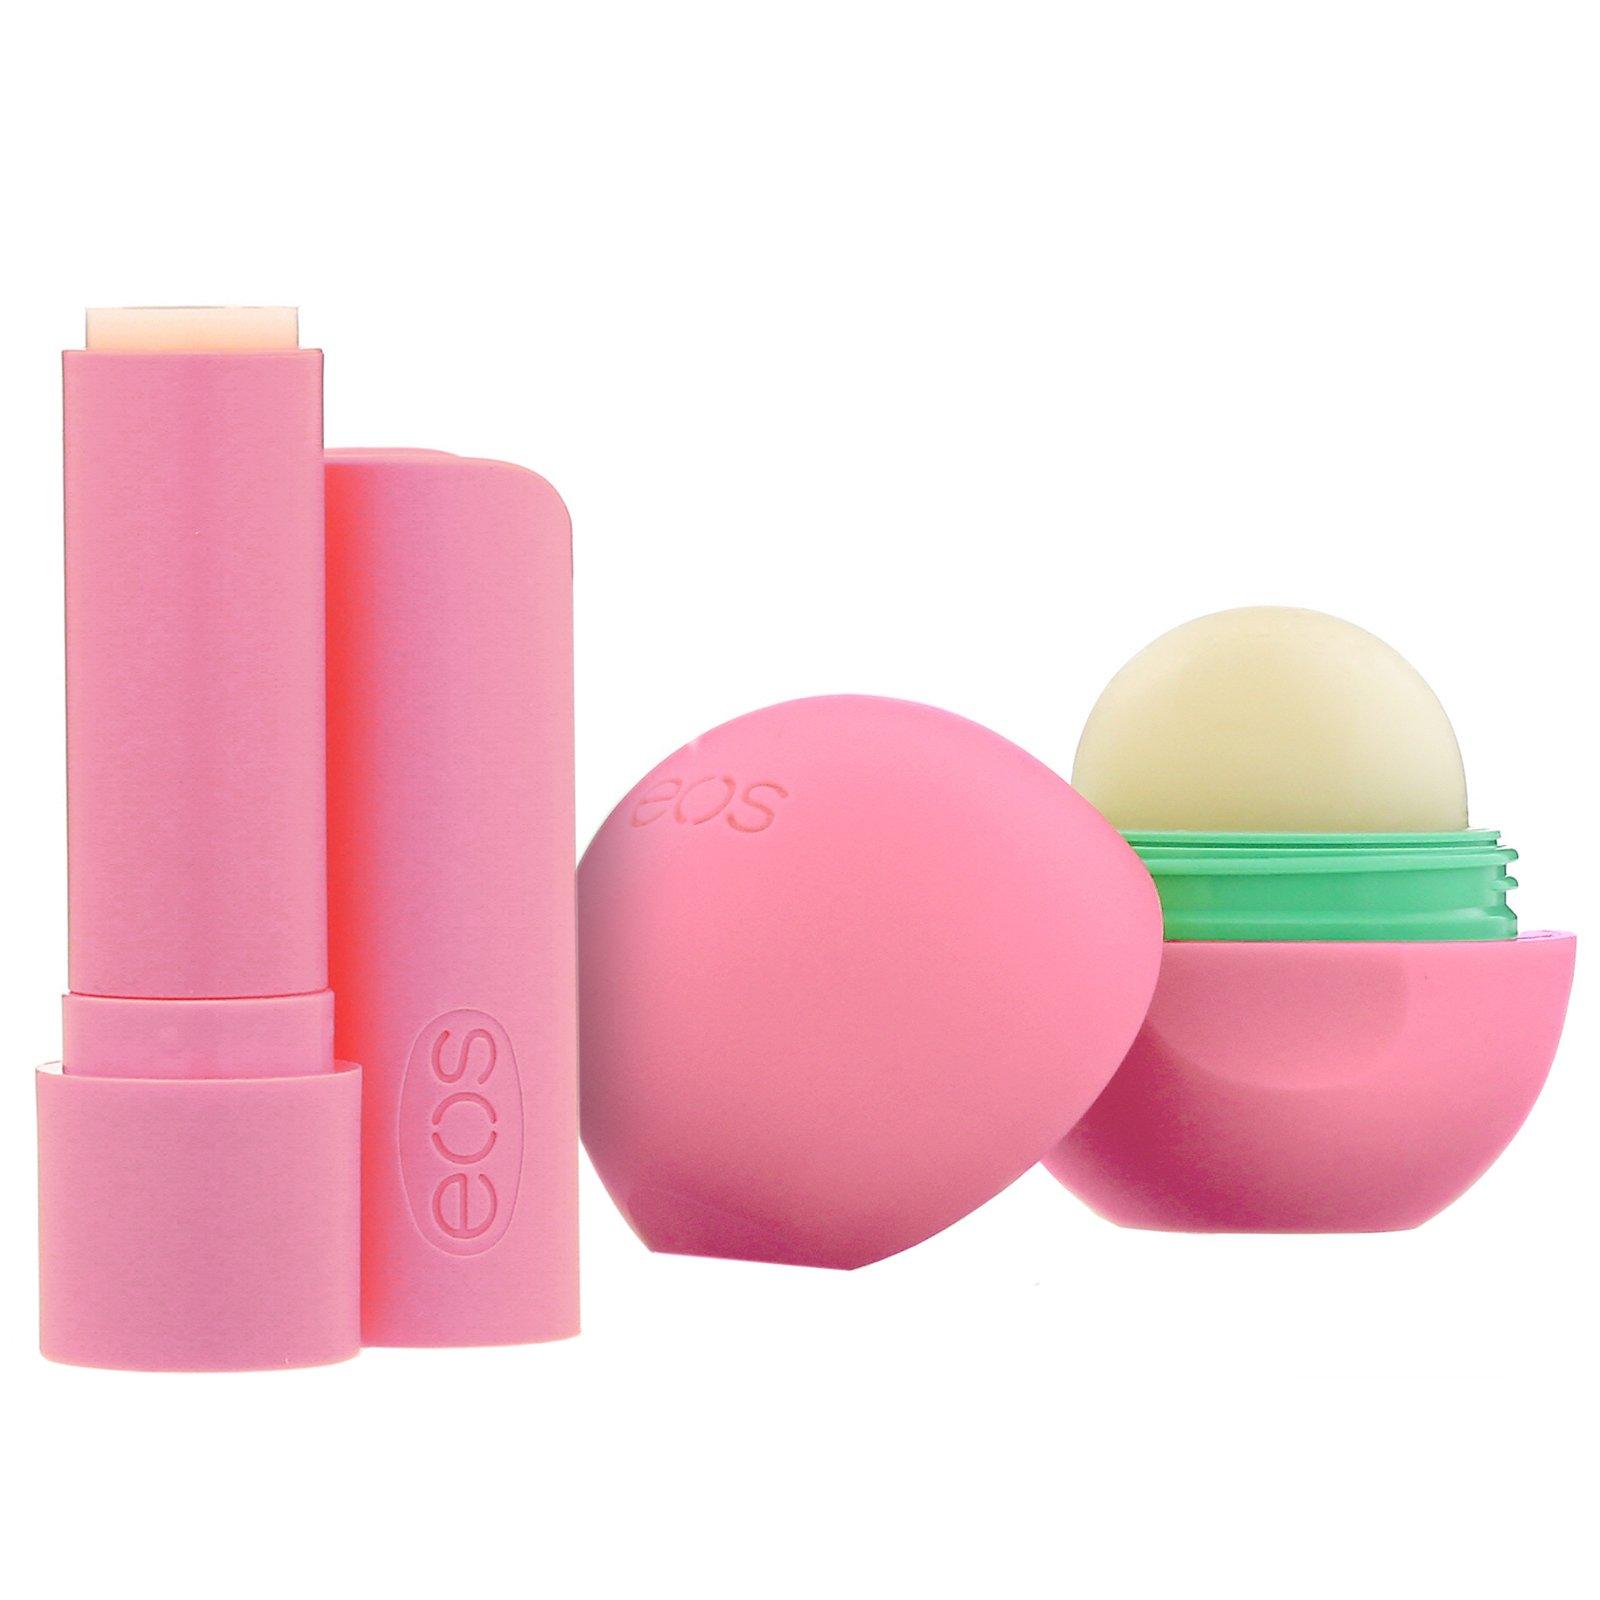 Kit com 2 lip balm Strawberry Sorbet | EOS